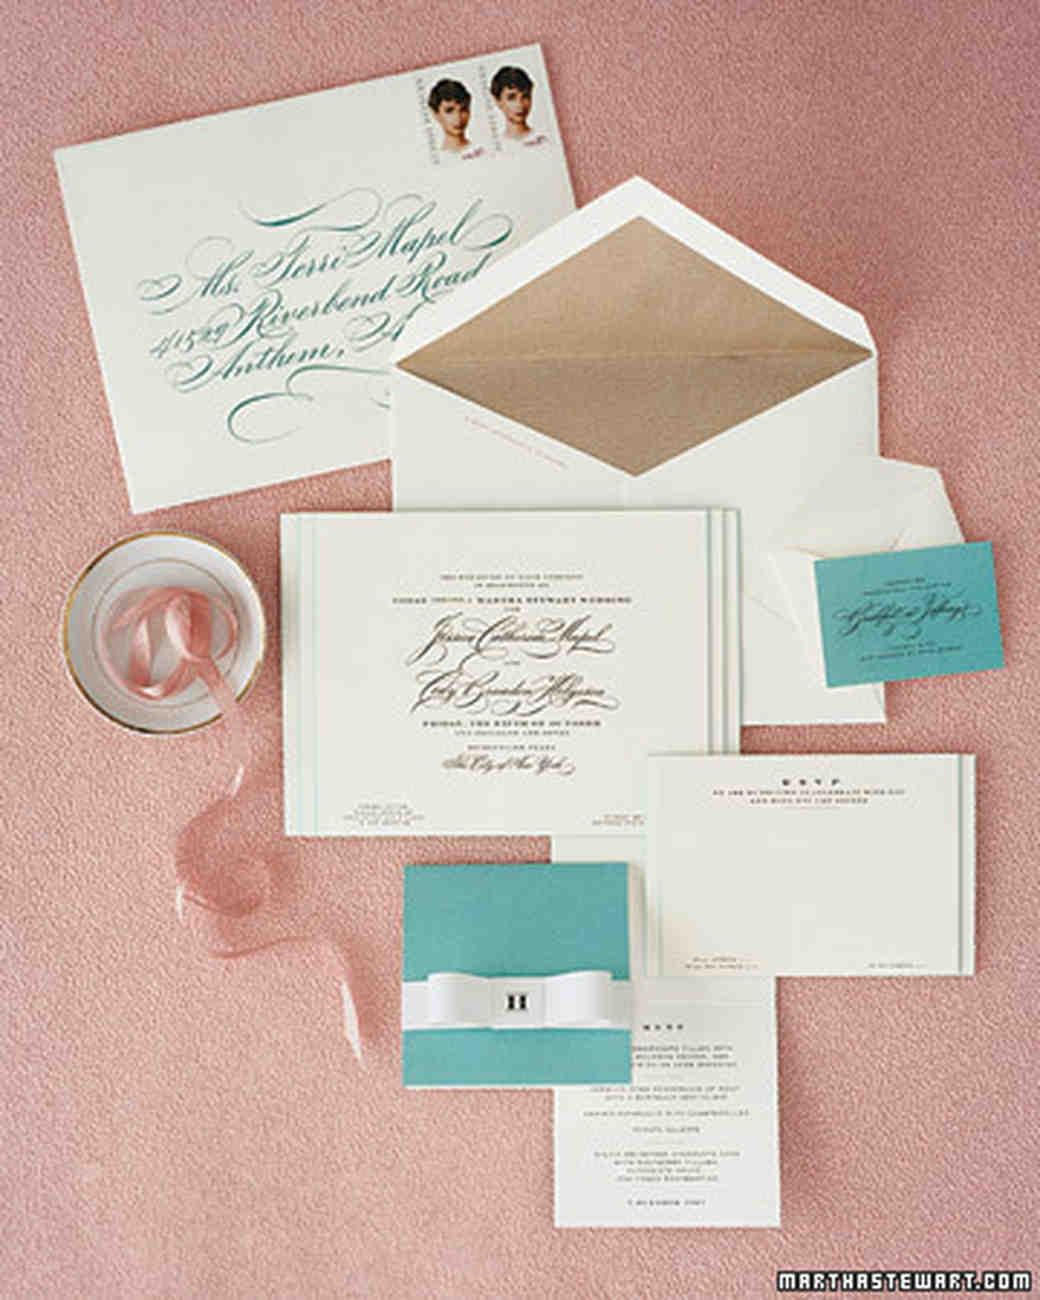 addressing wedding invitations no inner envelope family - 28 images ...